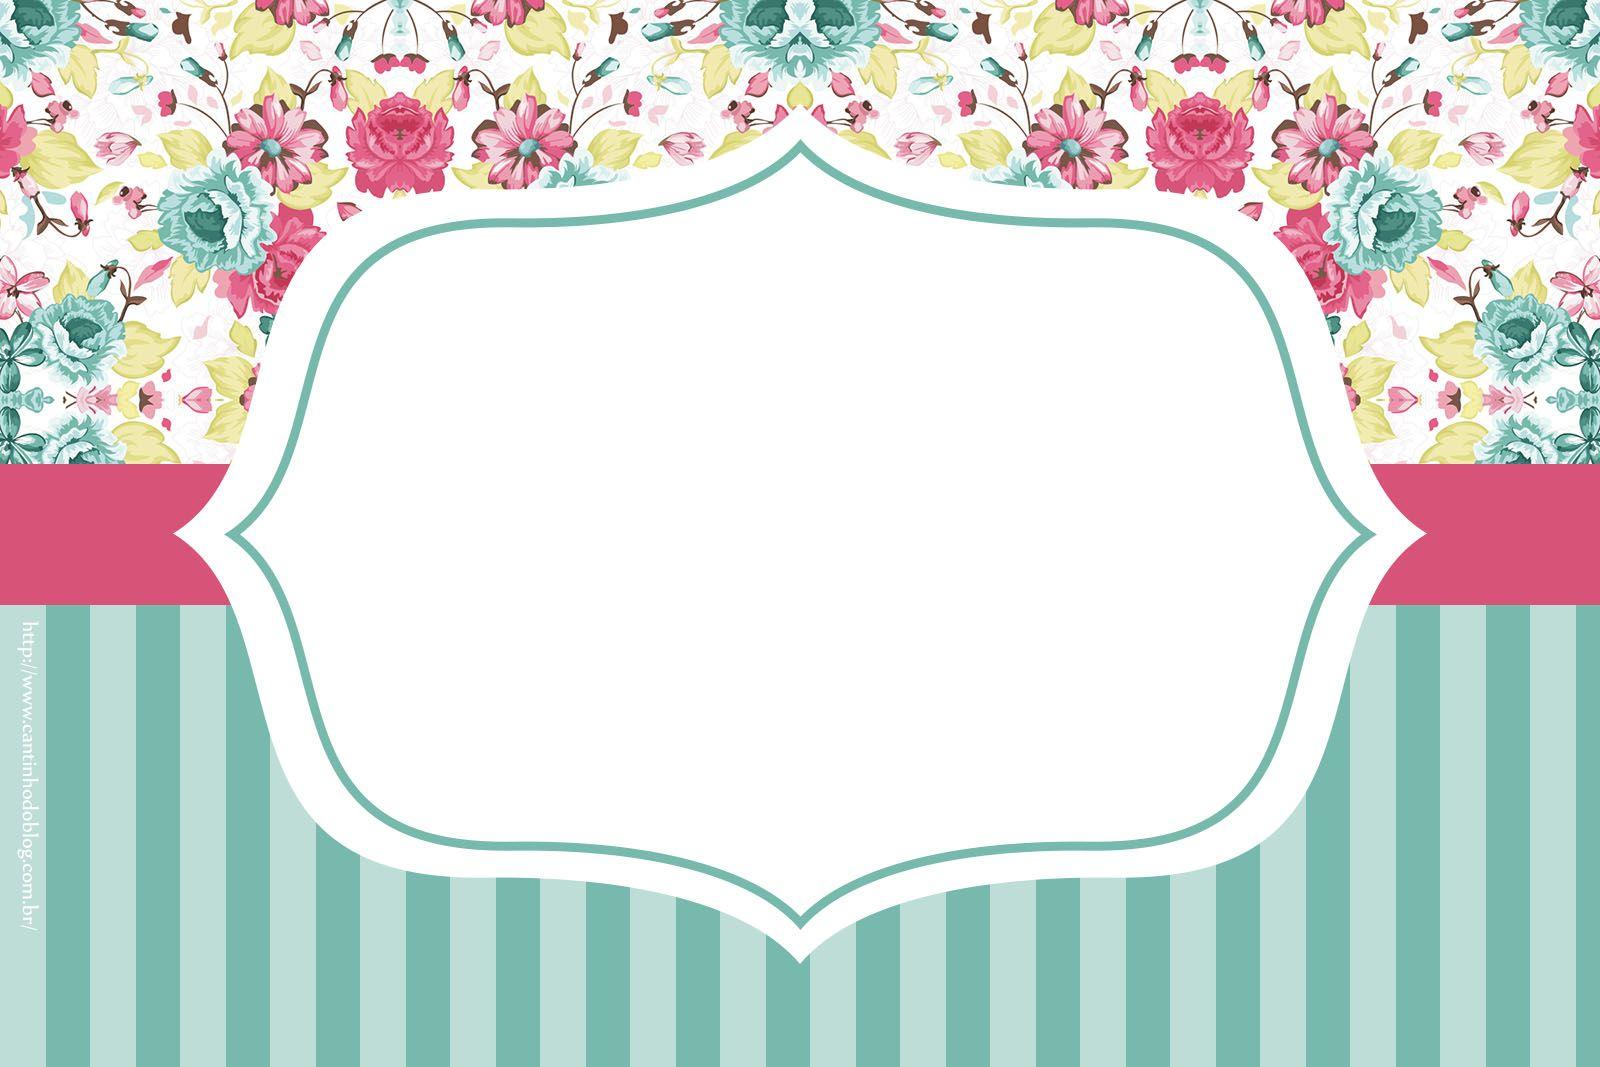 shabby-chic-blue-and-flowers-free-printable-invitations-008.jpg ...